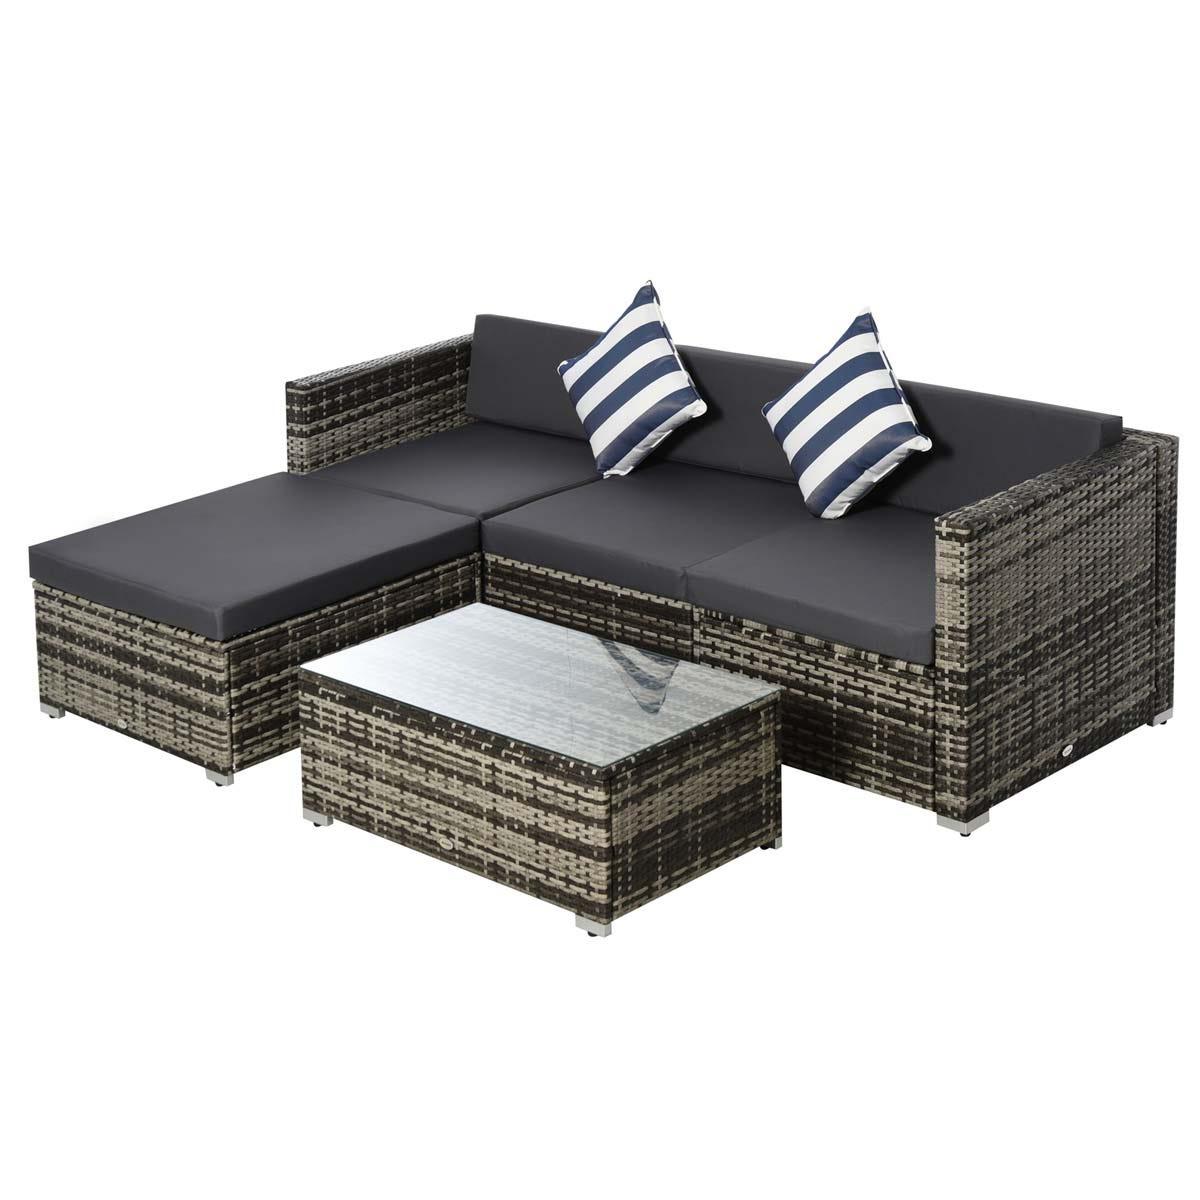 Outsunny 5 Piece Modular Rattan Sofa Set - Grey